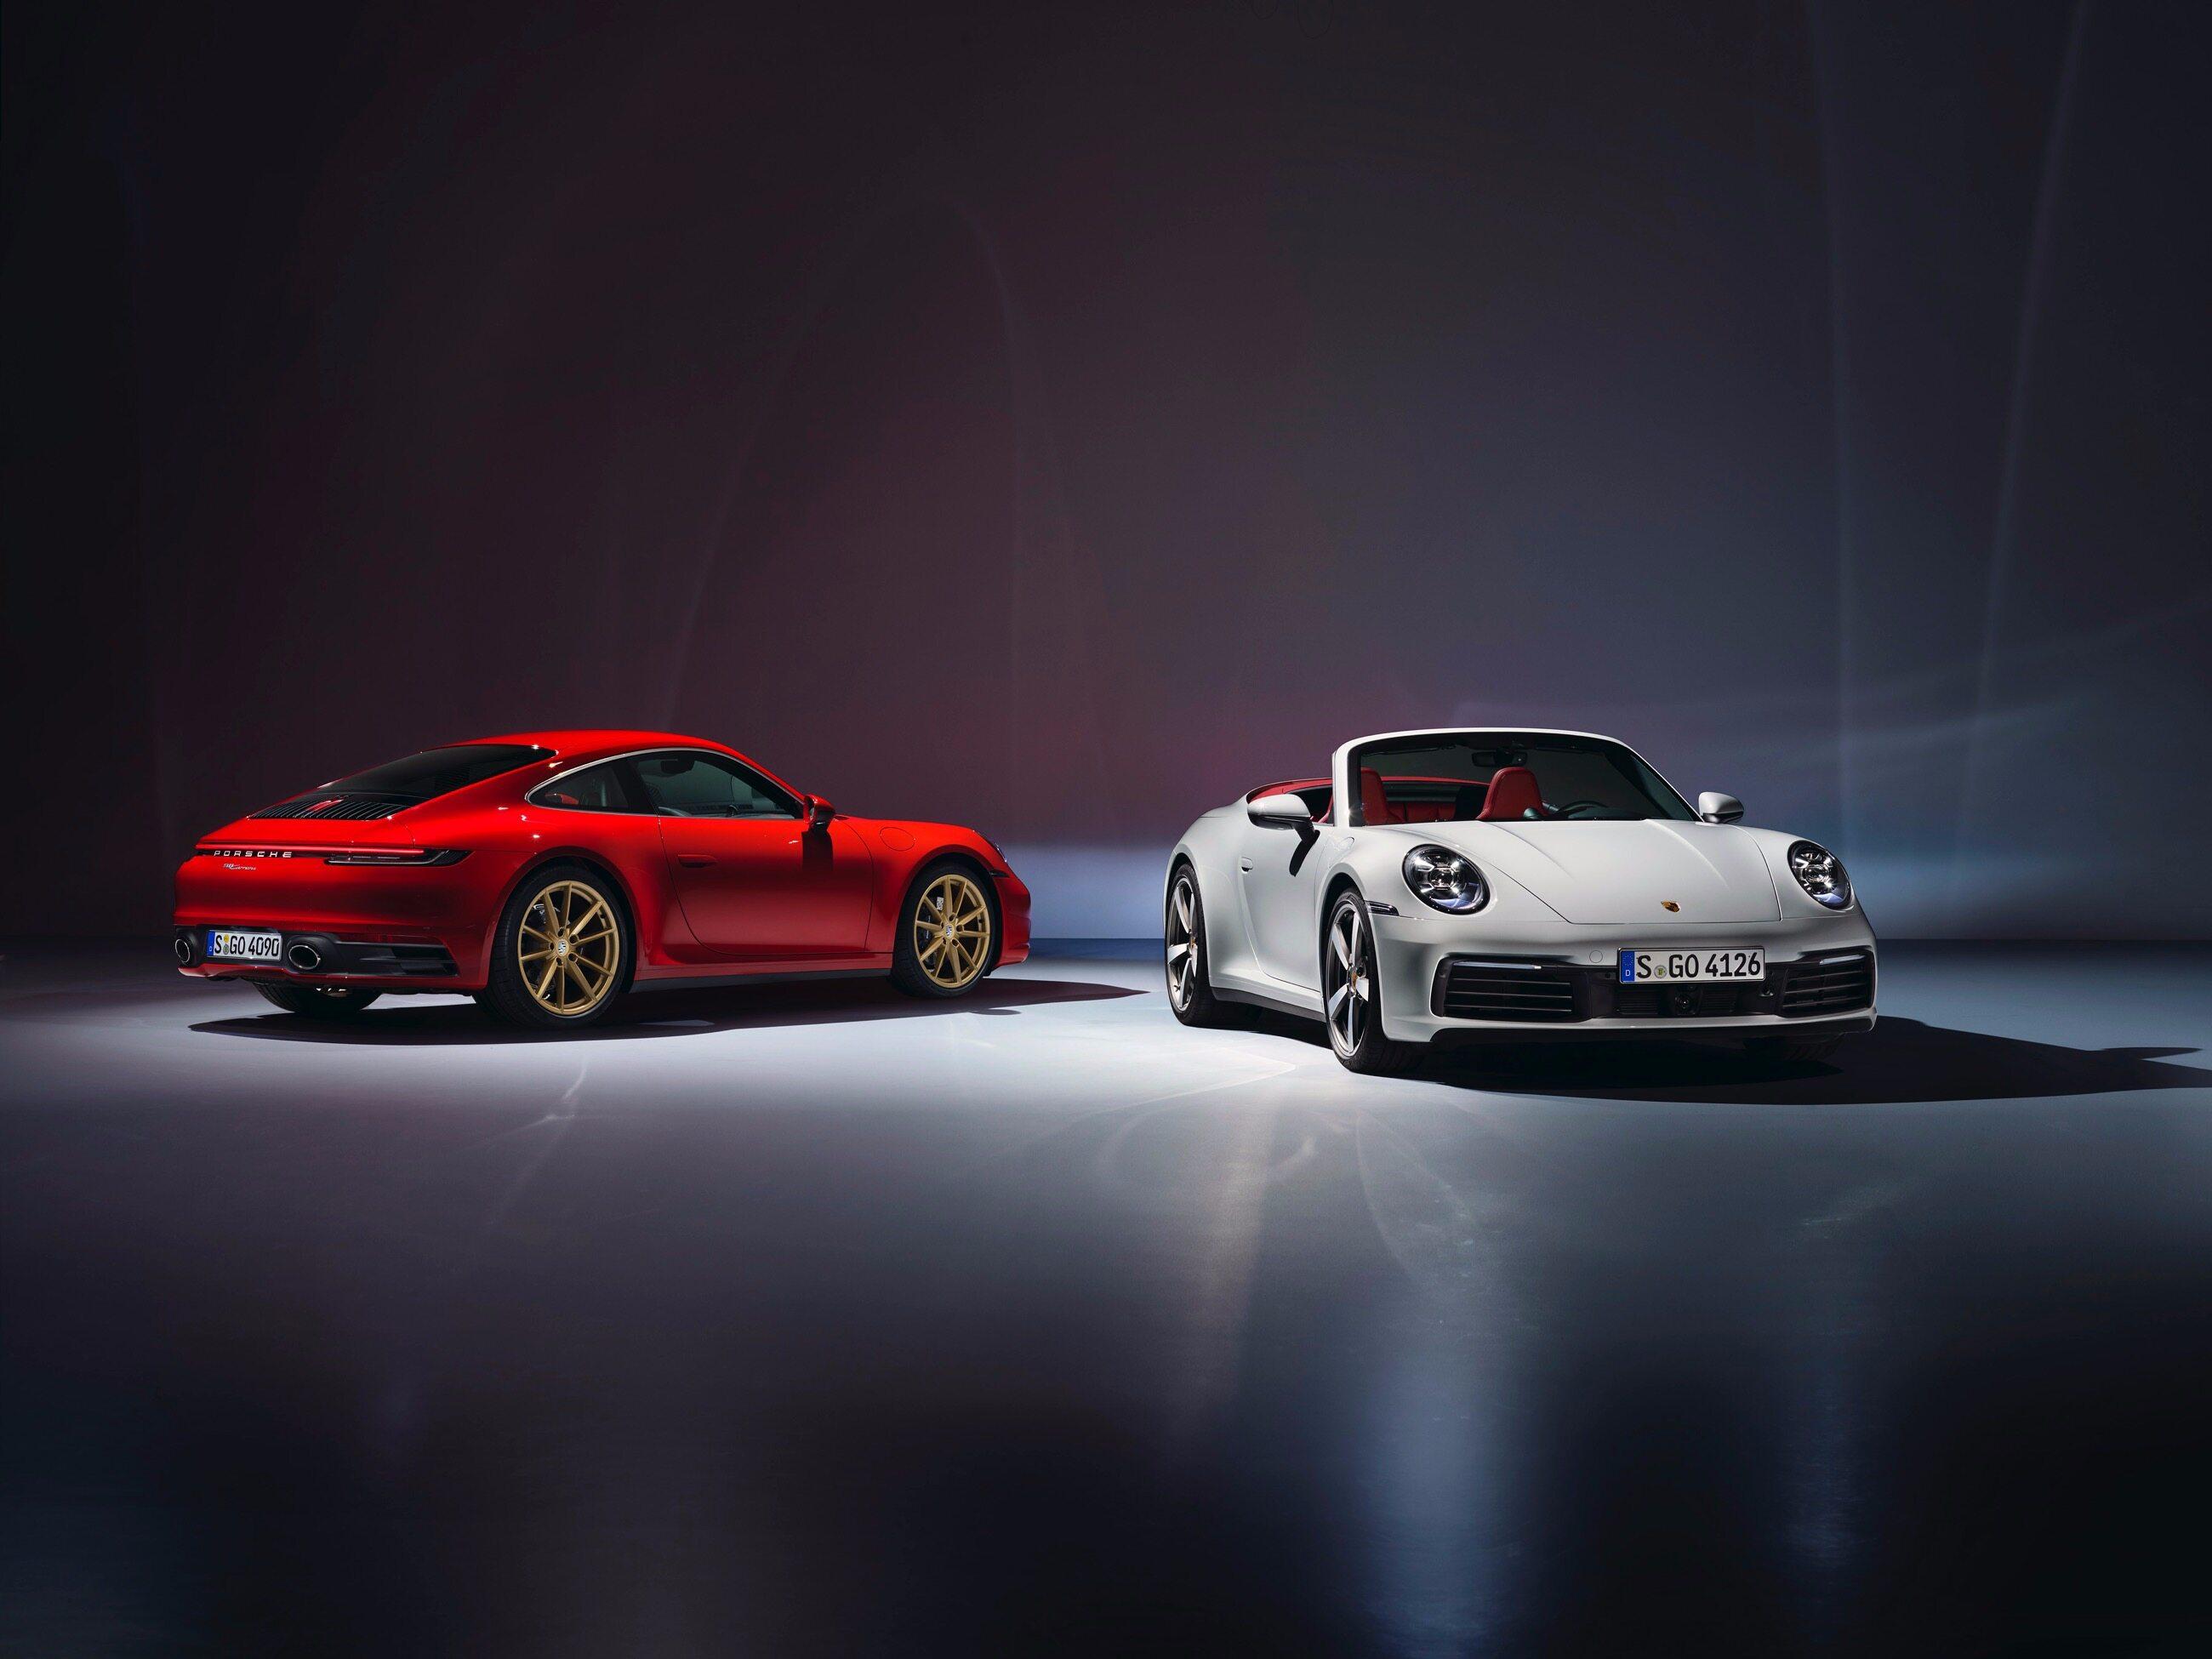 Porsche 911 Carrera Coupe i Porsche 911 Carrera Cabriolet